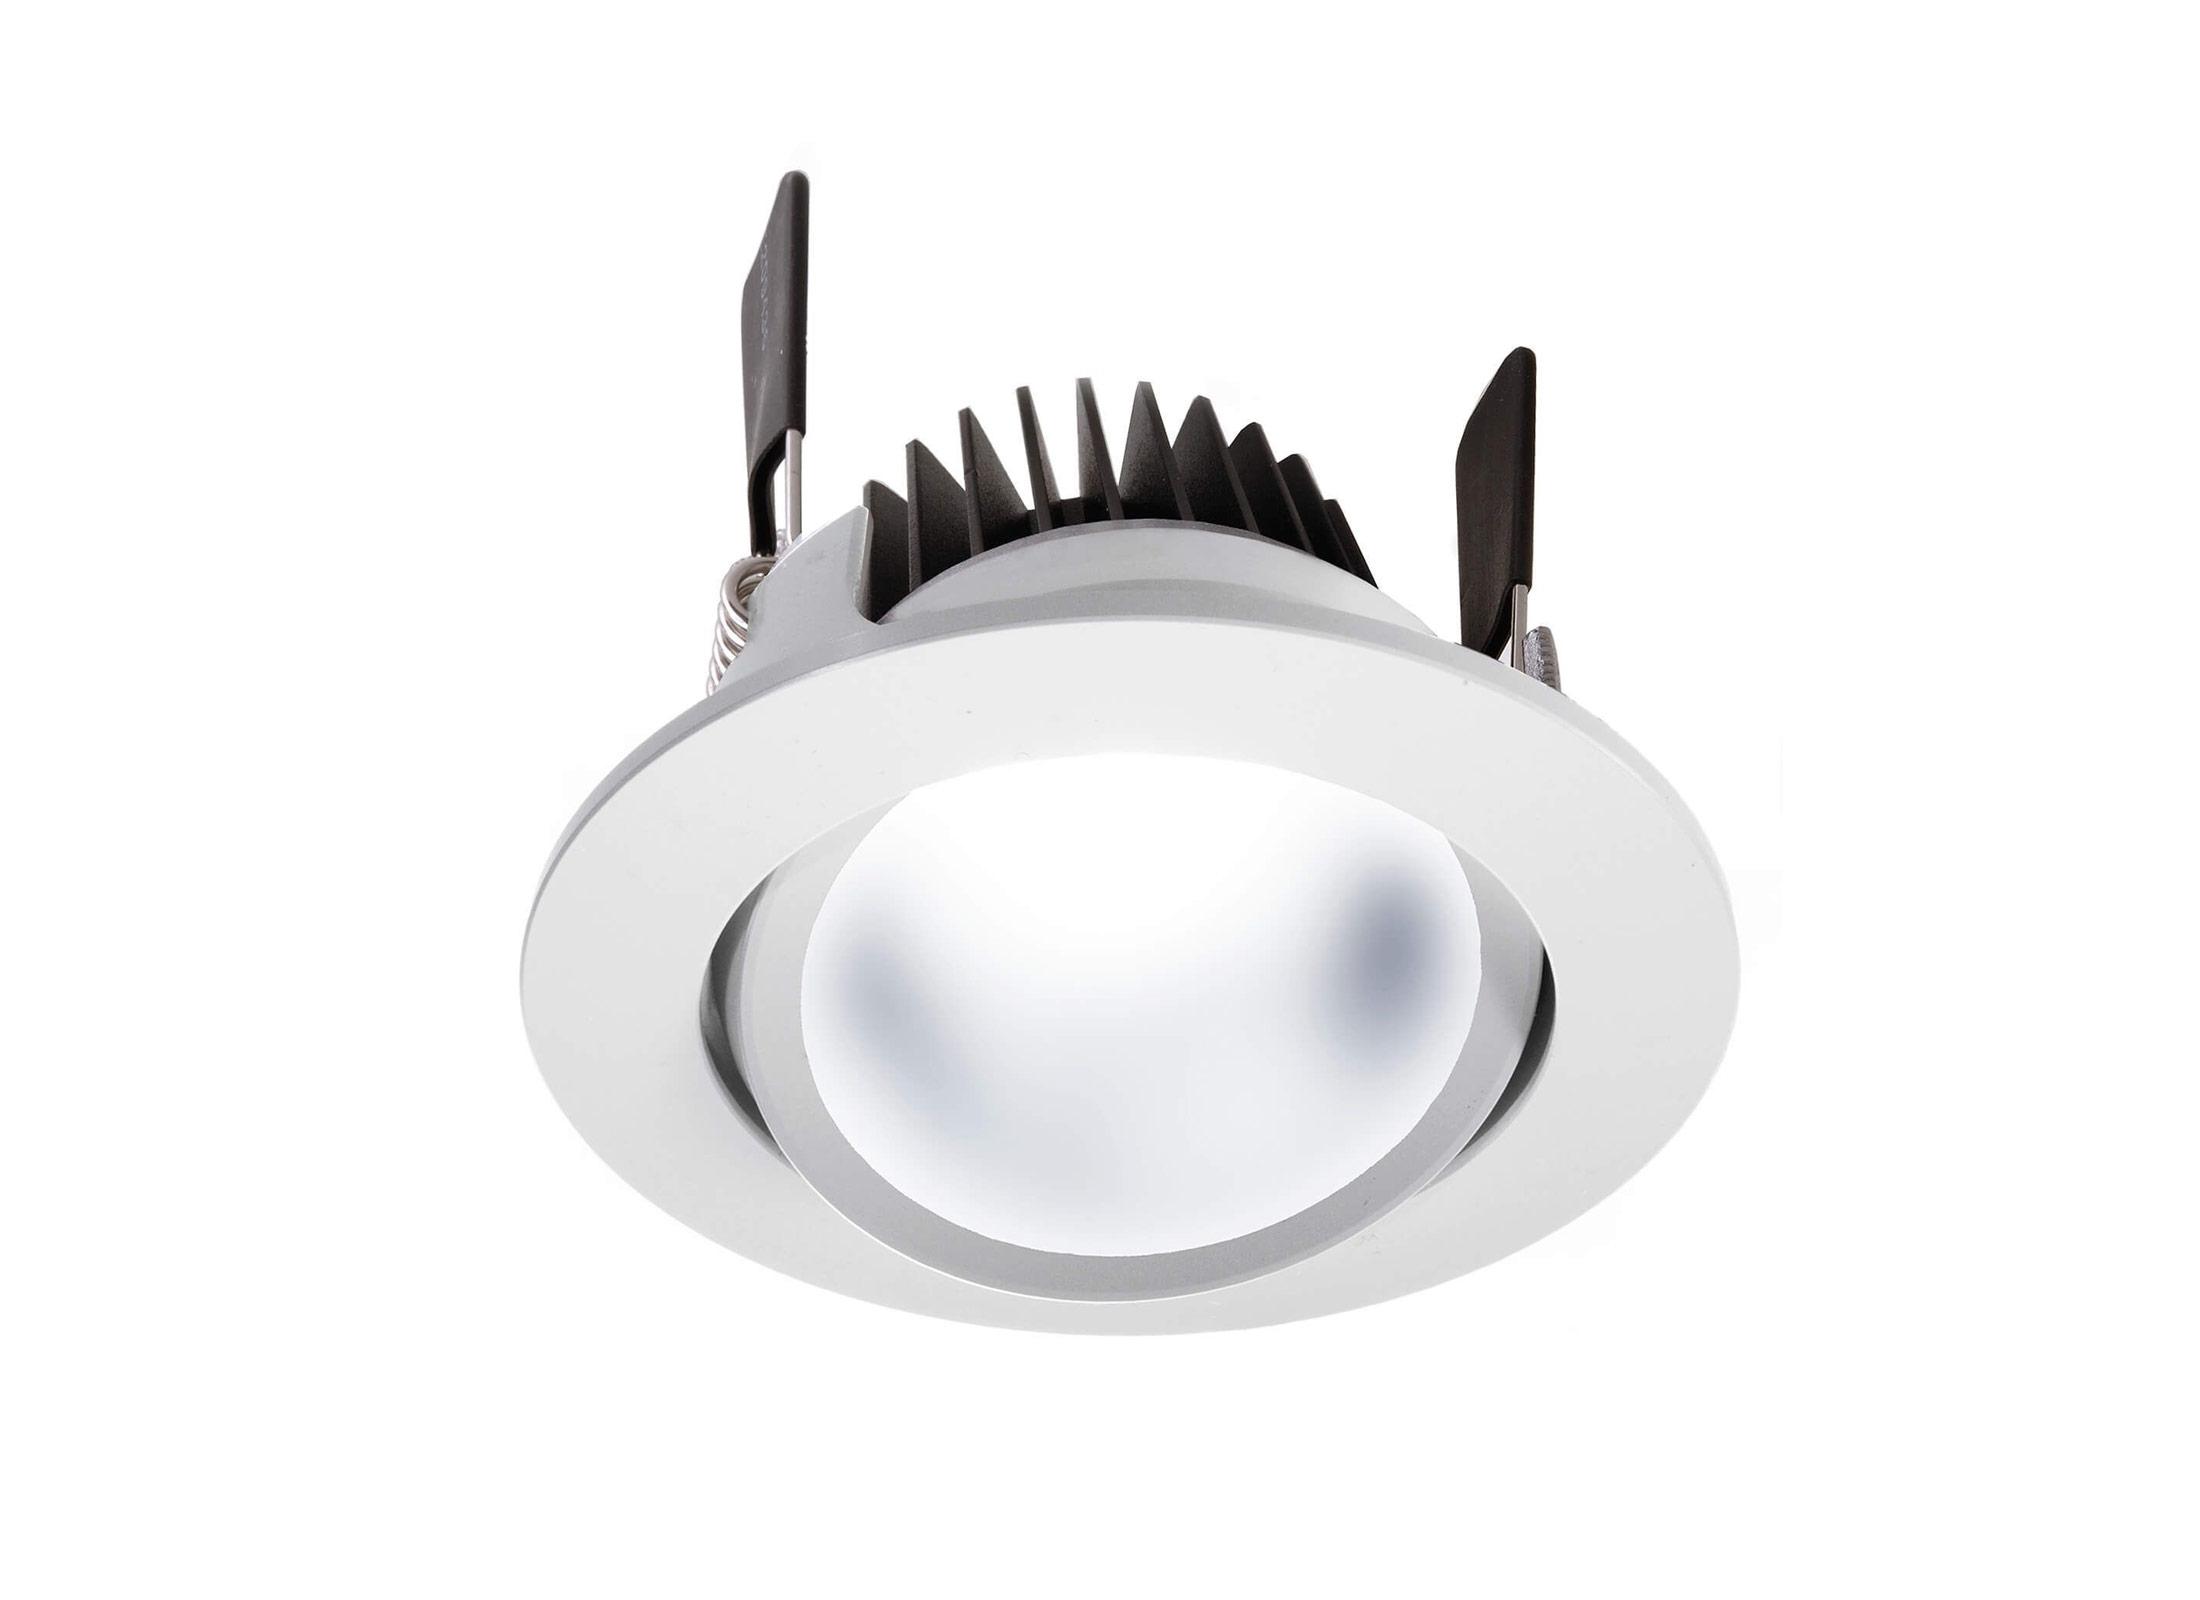 Deko Light COB 20 CCT LED Deckeneinbauleuchte, WW/CW, 20 20K, 20x 20W  LED, 20°, 20lm, OHNE NETZTEIL